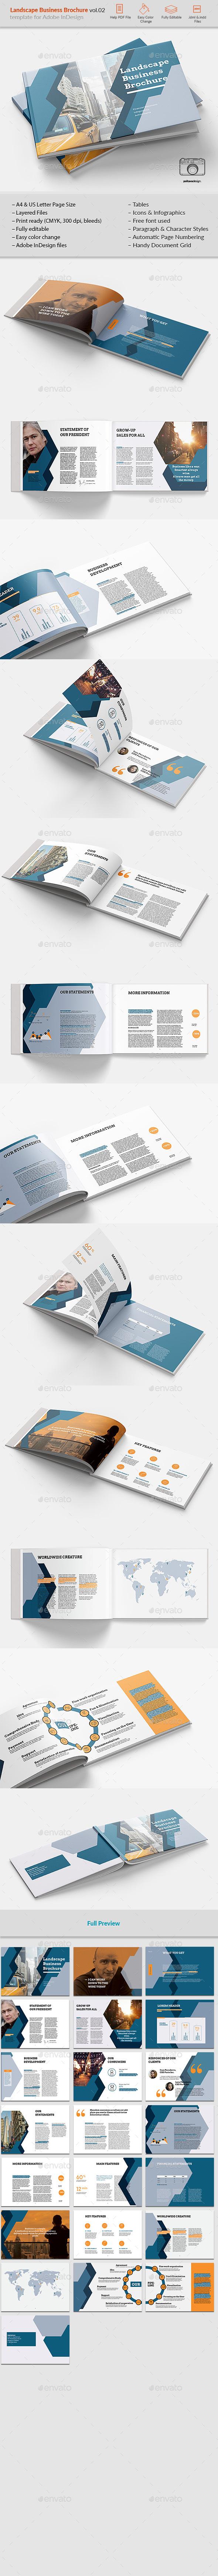 Landsape Business Brochure vol.02 - Brochures Print Templates